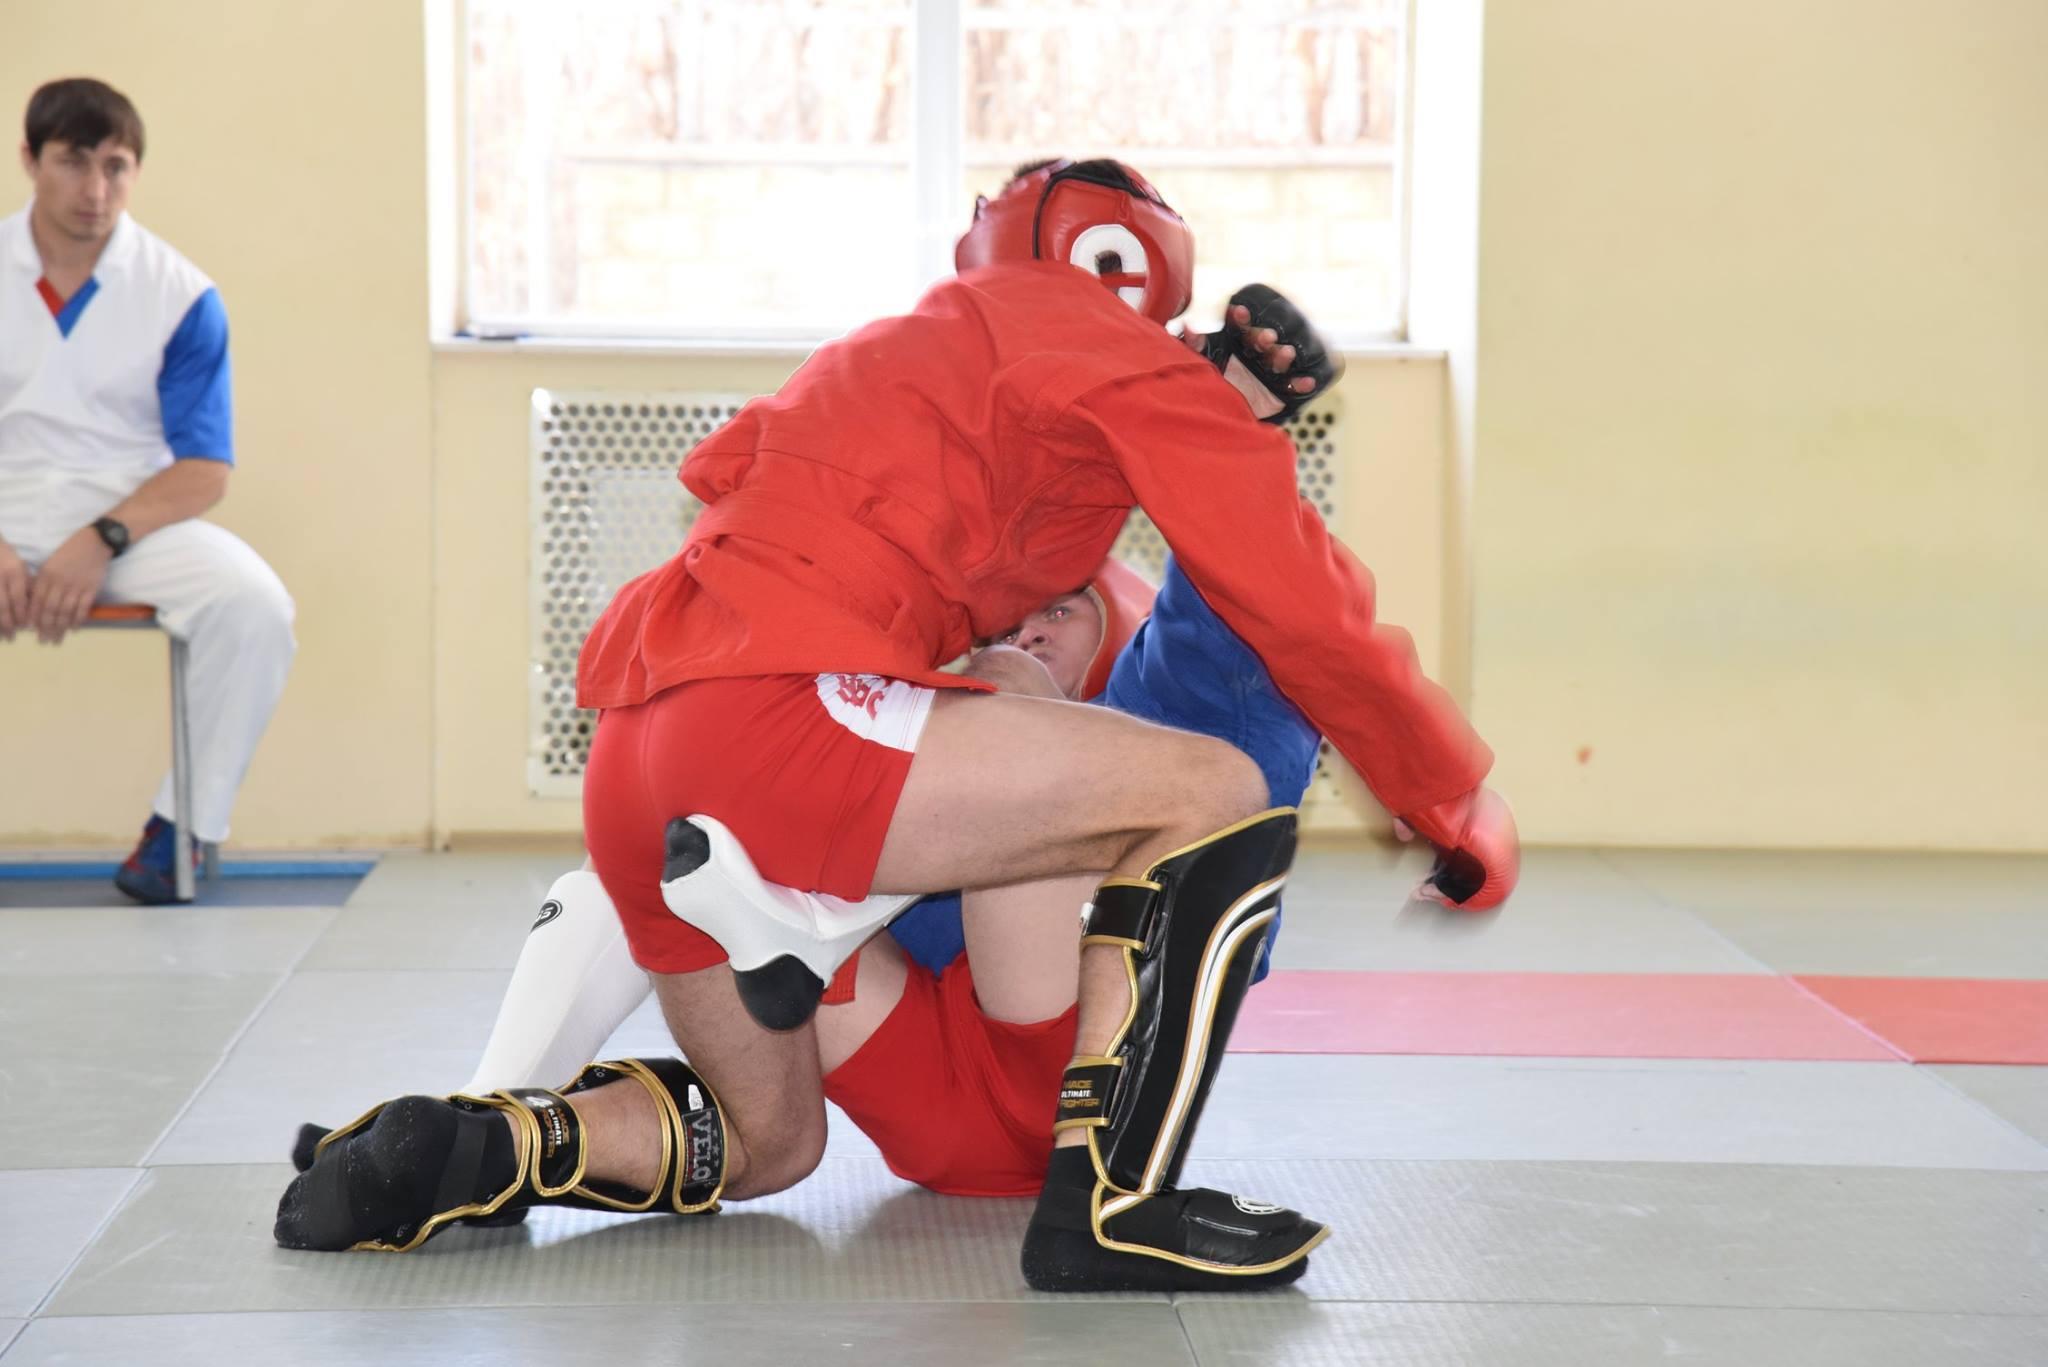 Lupta corp la corp din cadrul Spartachiadei CSC Dinamo 20187